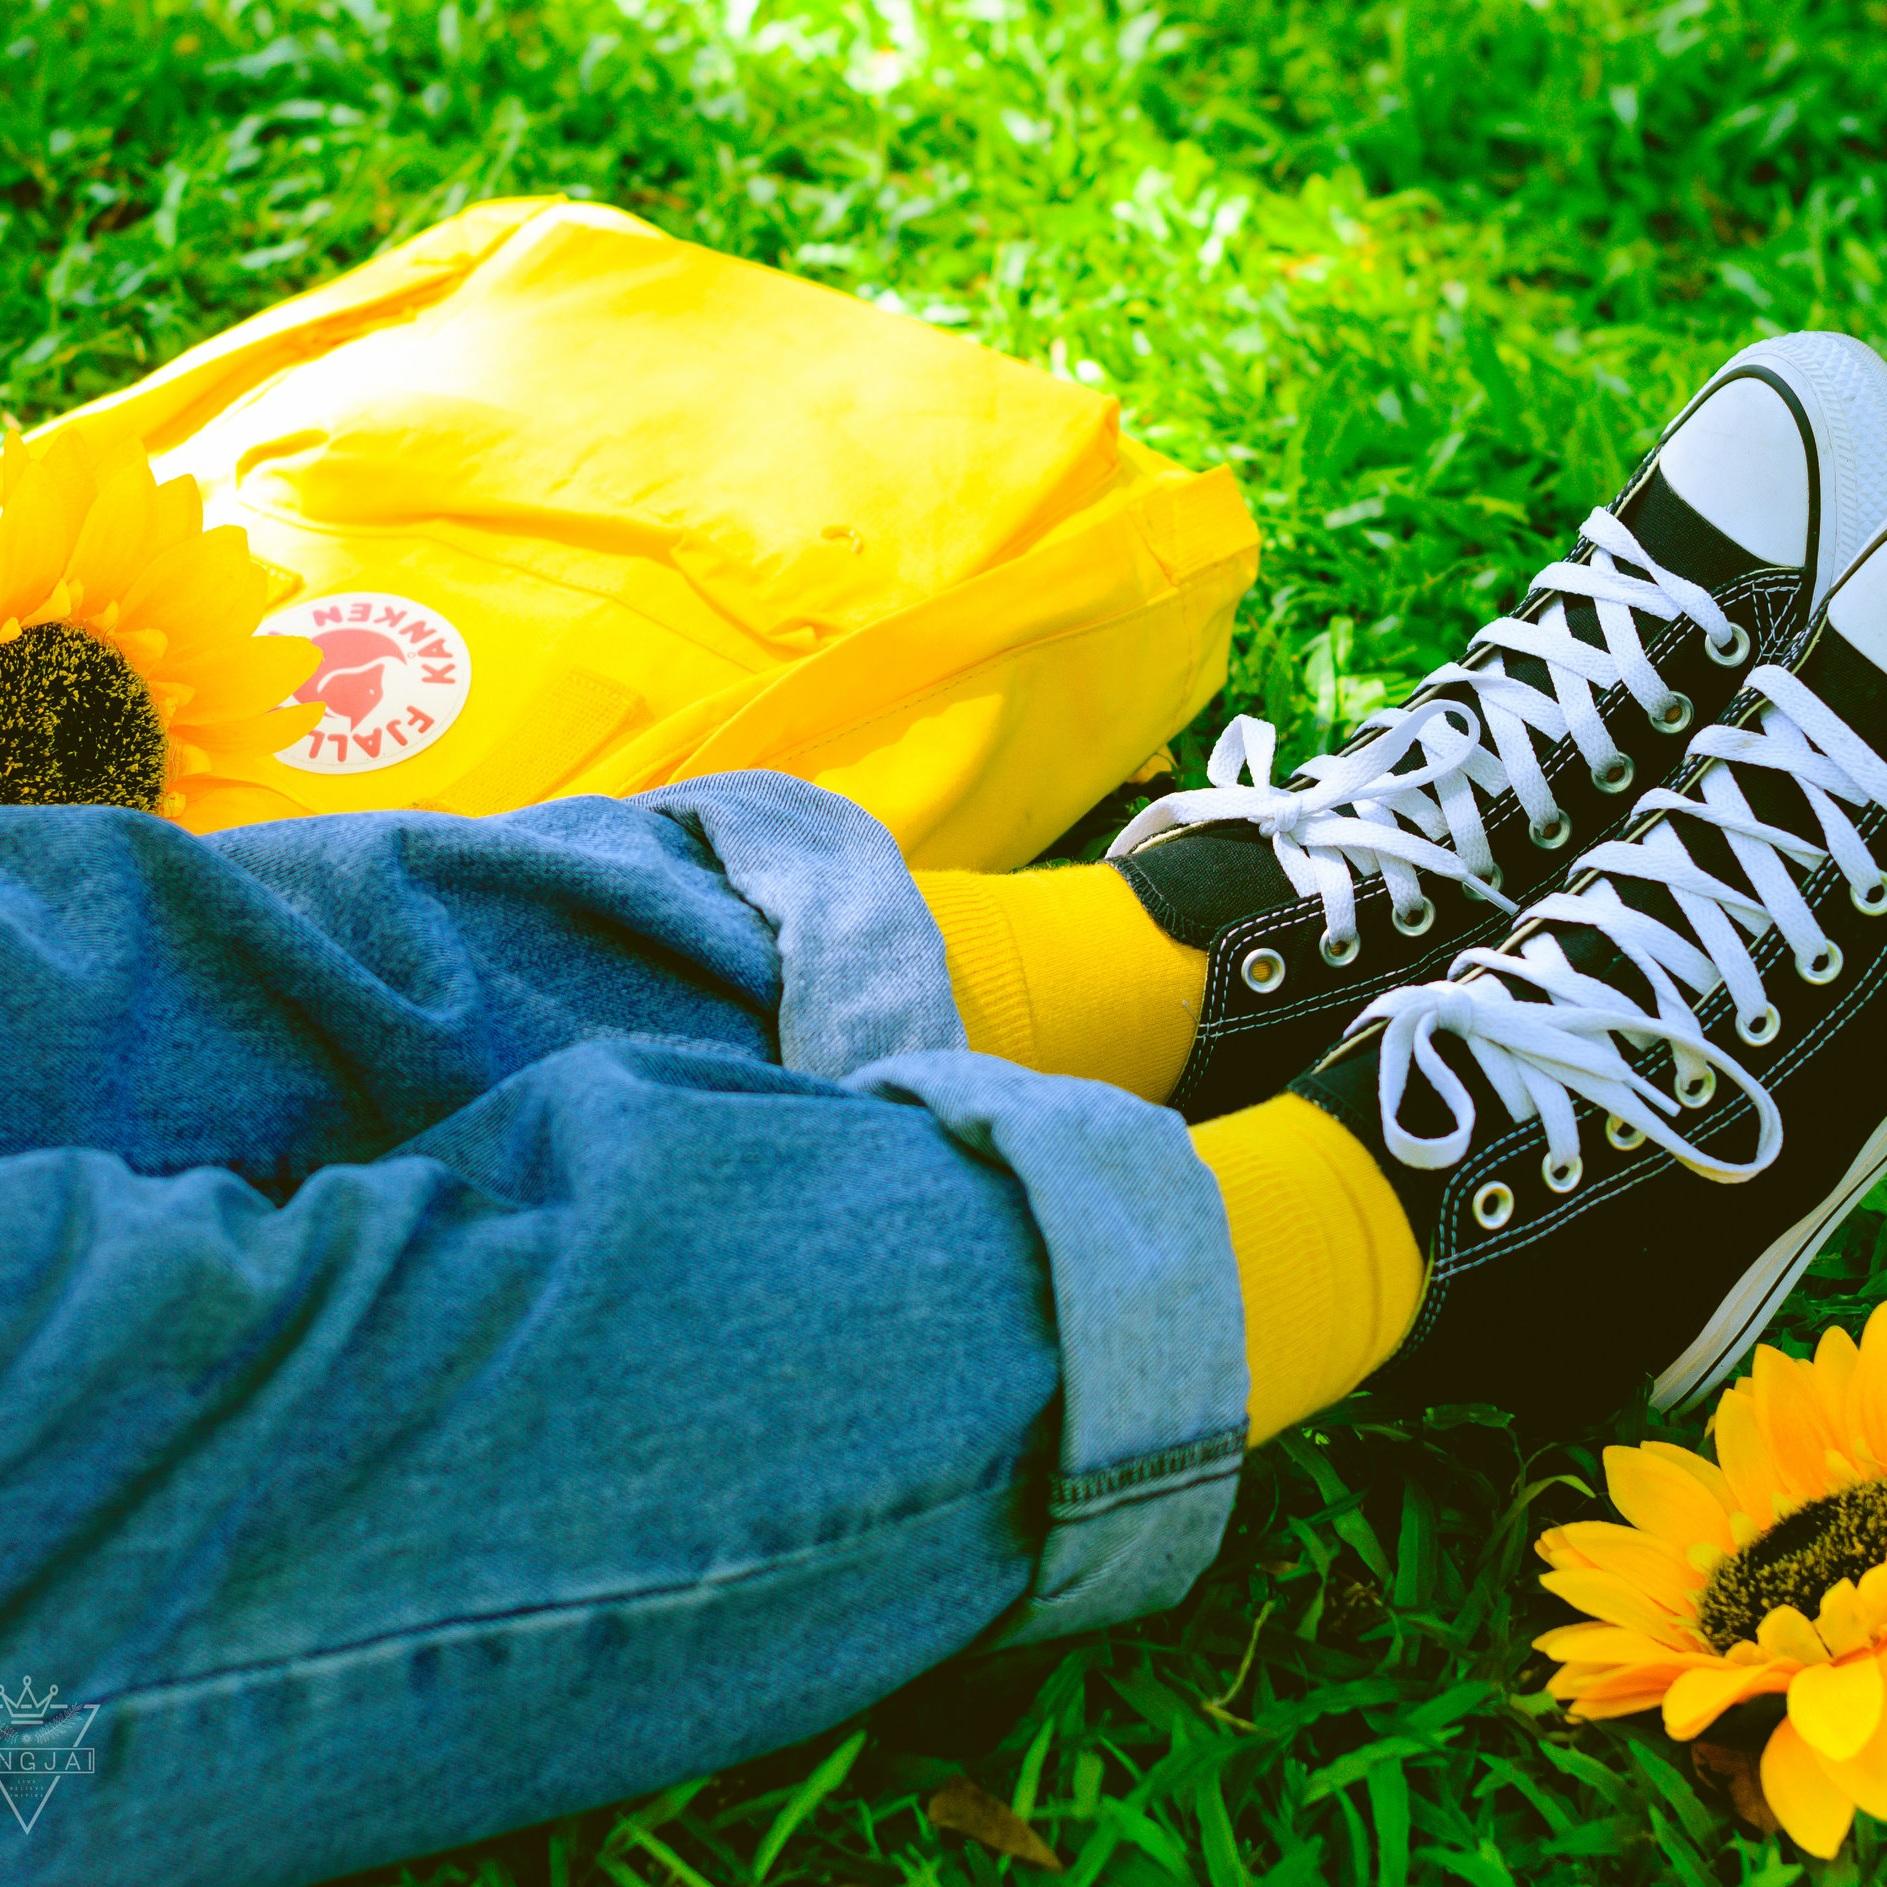 Socks - Soft & Sour!